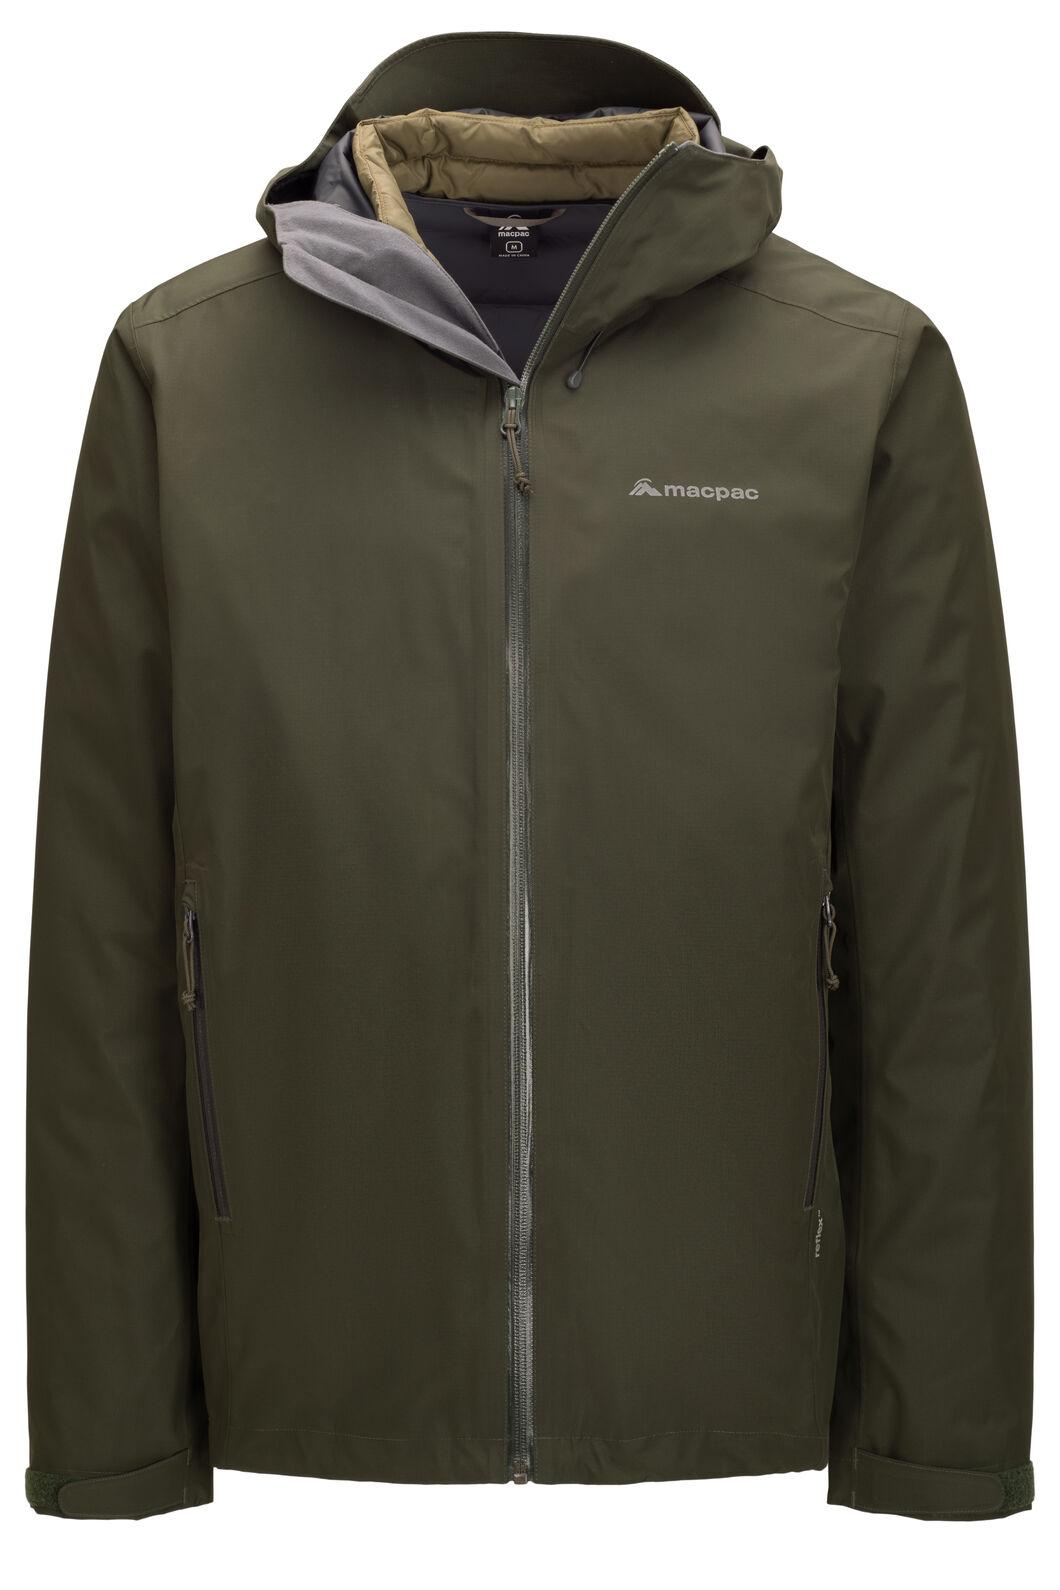 Macpac Men's Névé Three-In-One Reflex™ Jacket, Rosin, hi-res